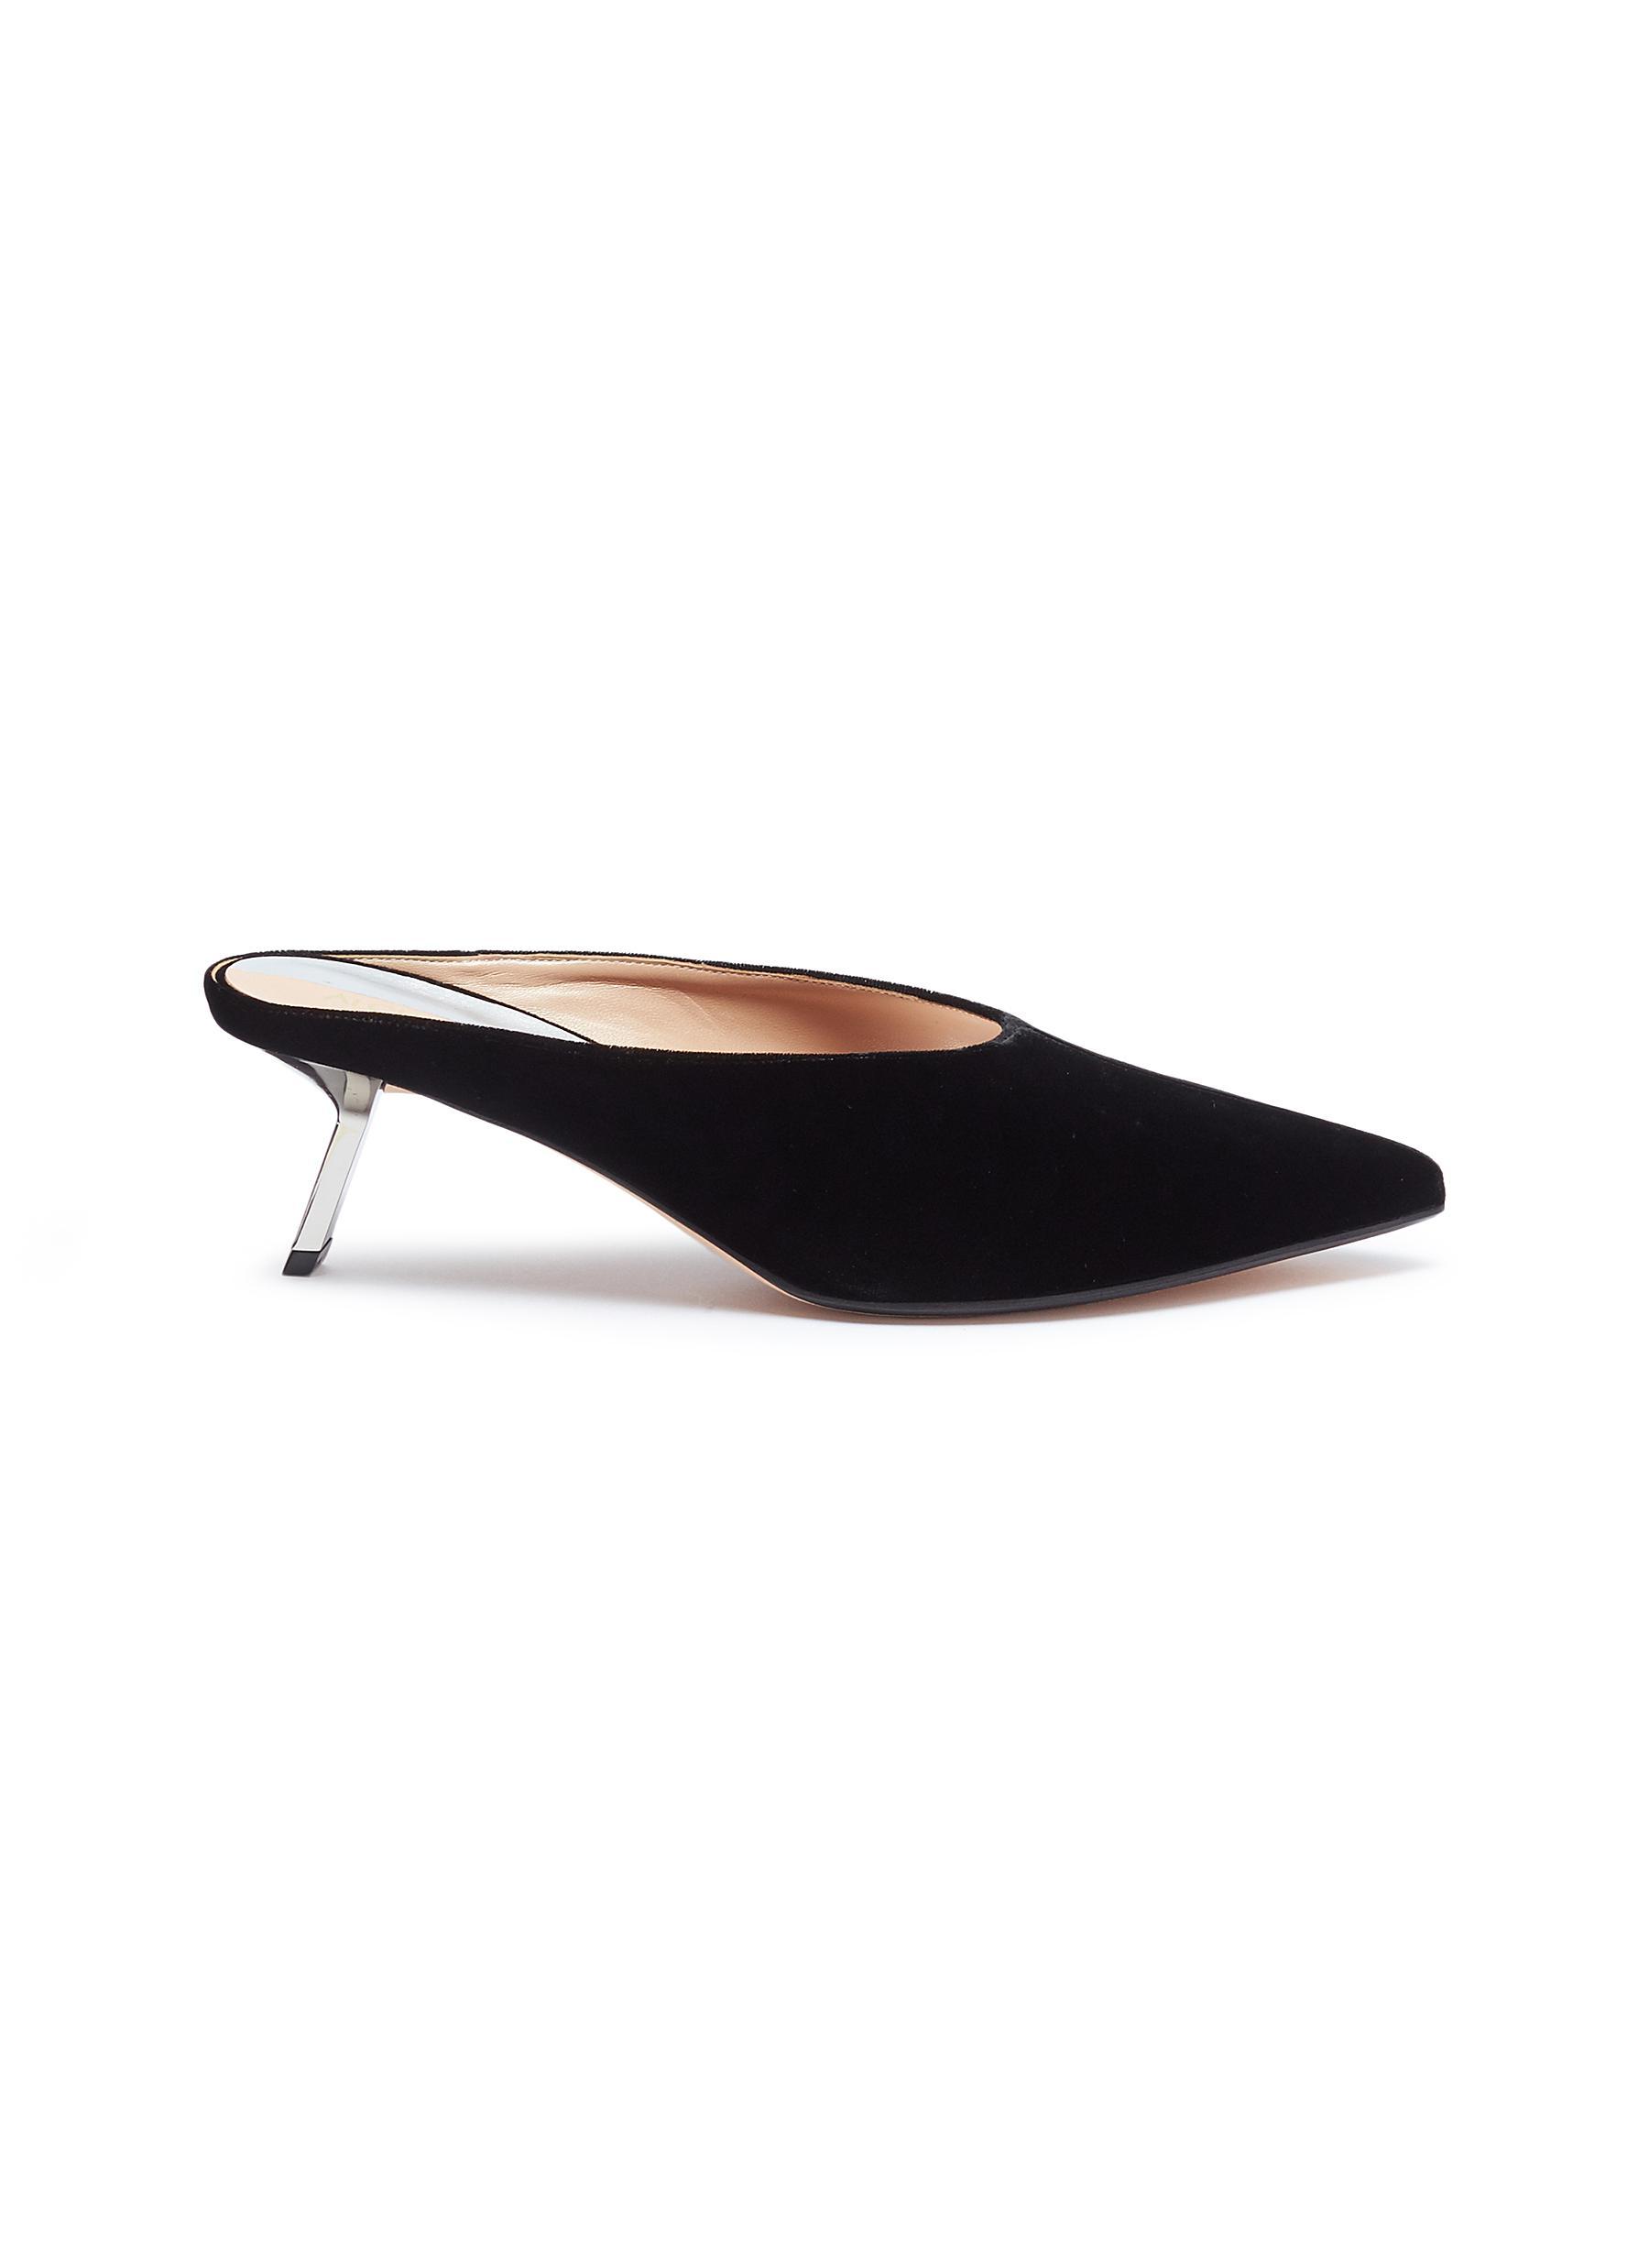 Aster slanted heel velvet mules by Alchimia di Ballin